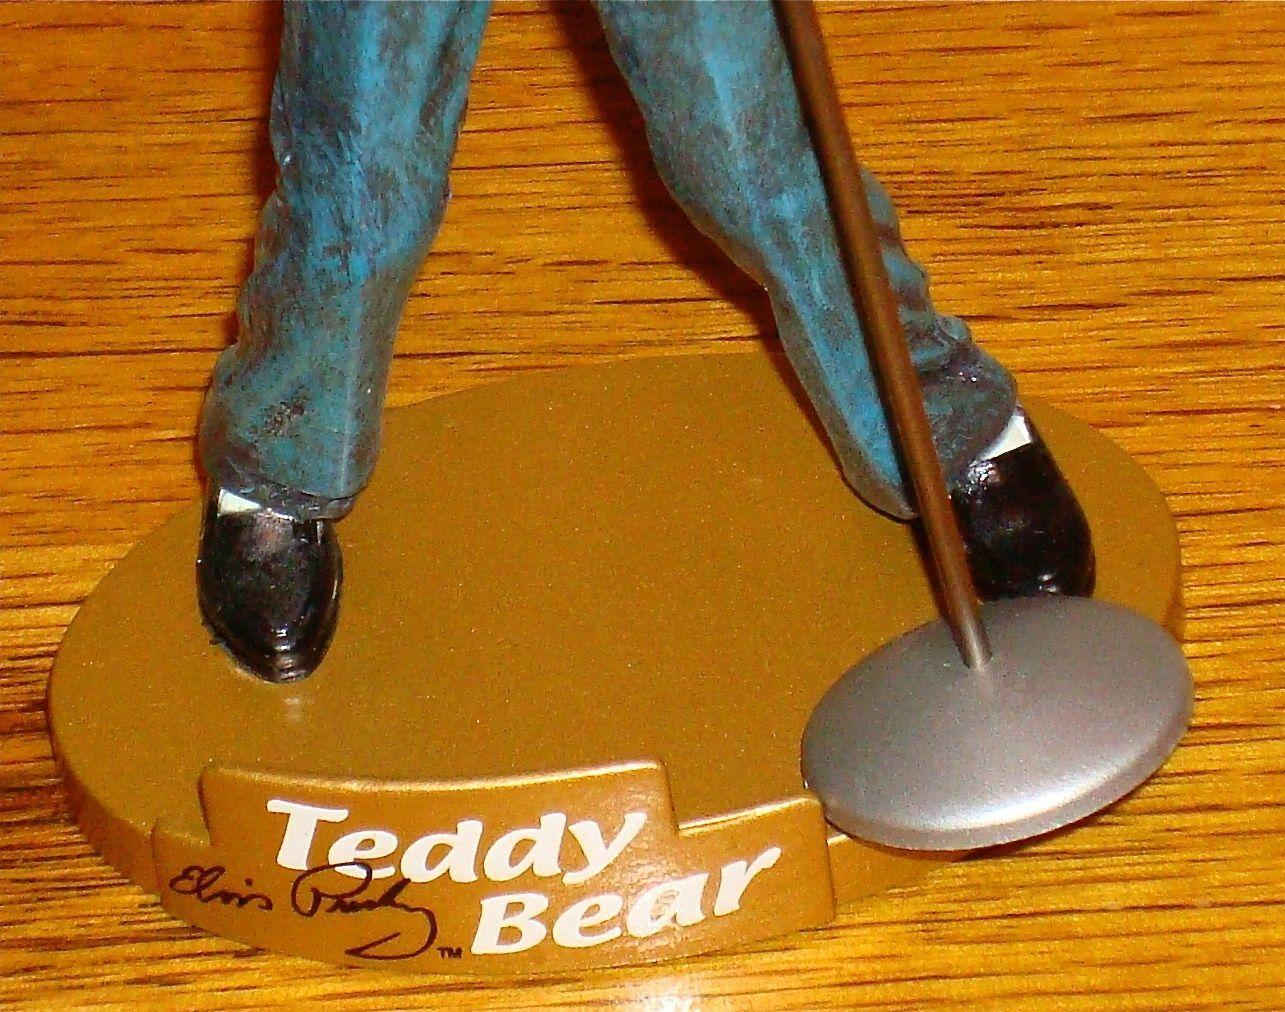 ELVIS PRESLEY TEDDY BEAR FIGURINE 2002 E.P.E.